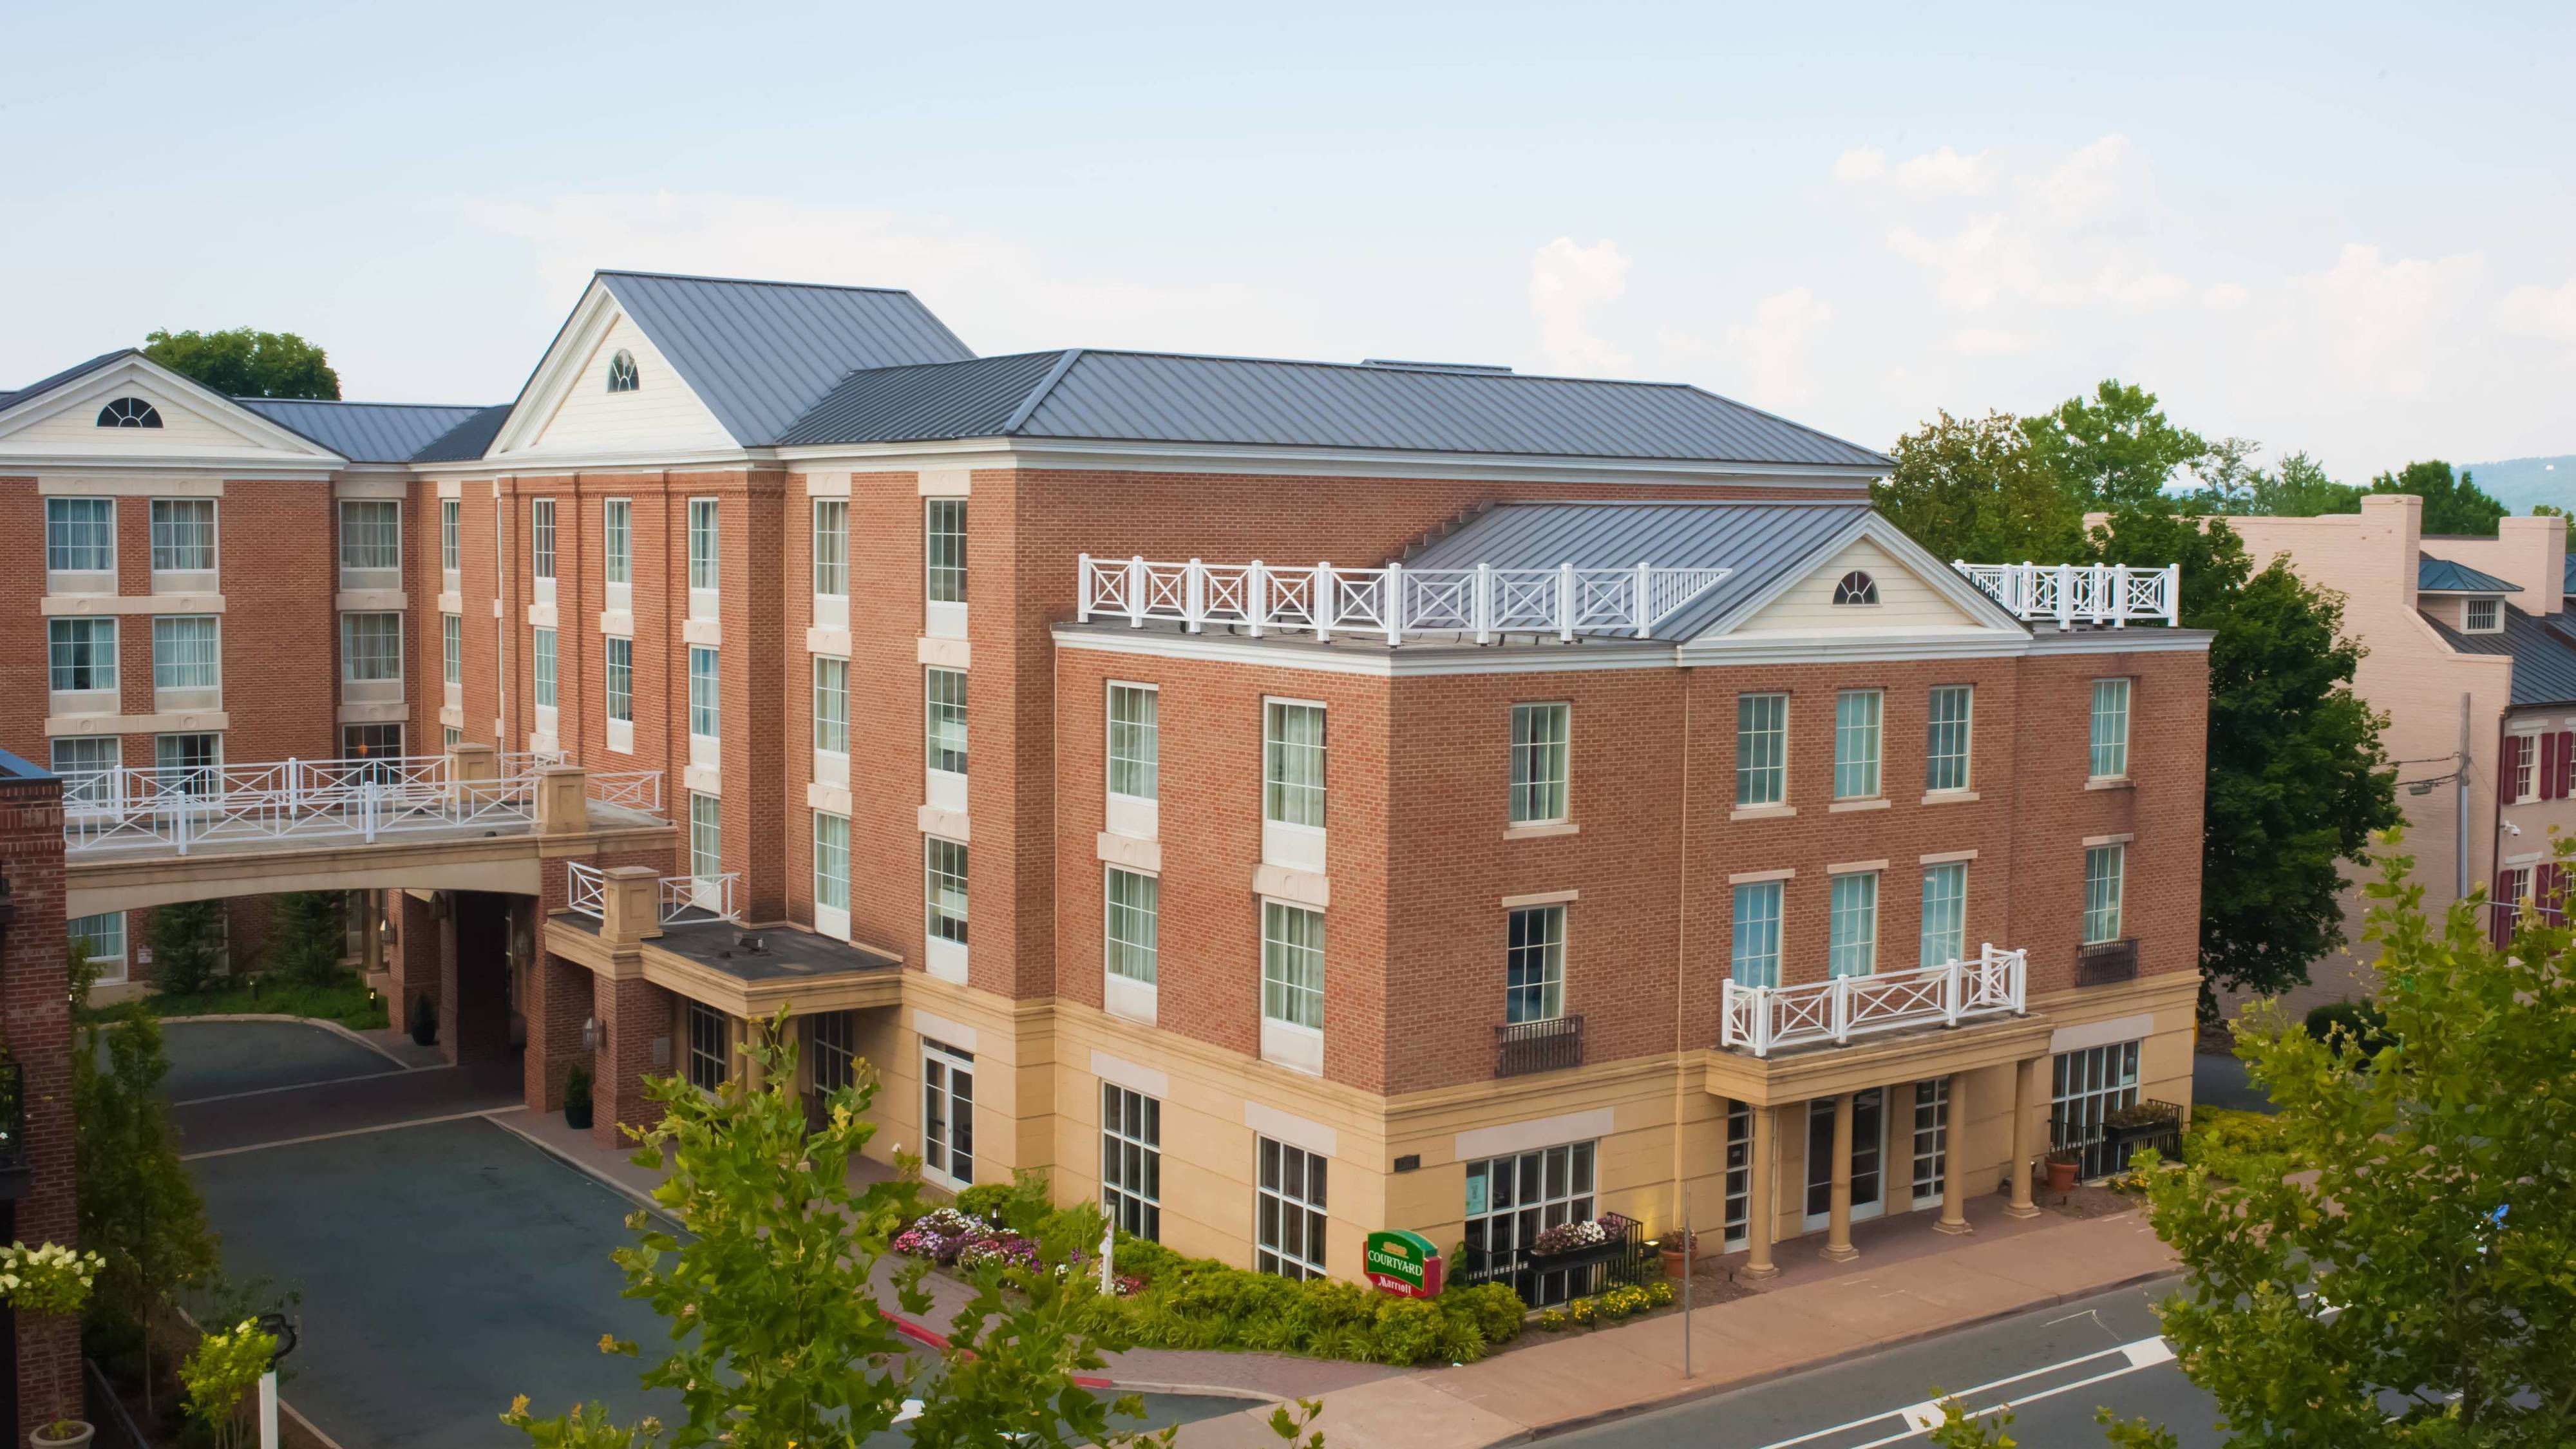 Courtyard by Marriott Charlottesville - University Medical Center image 0